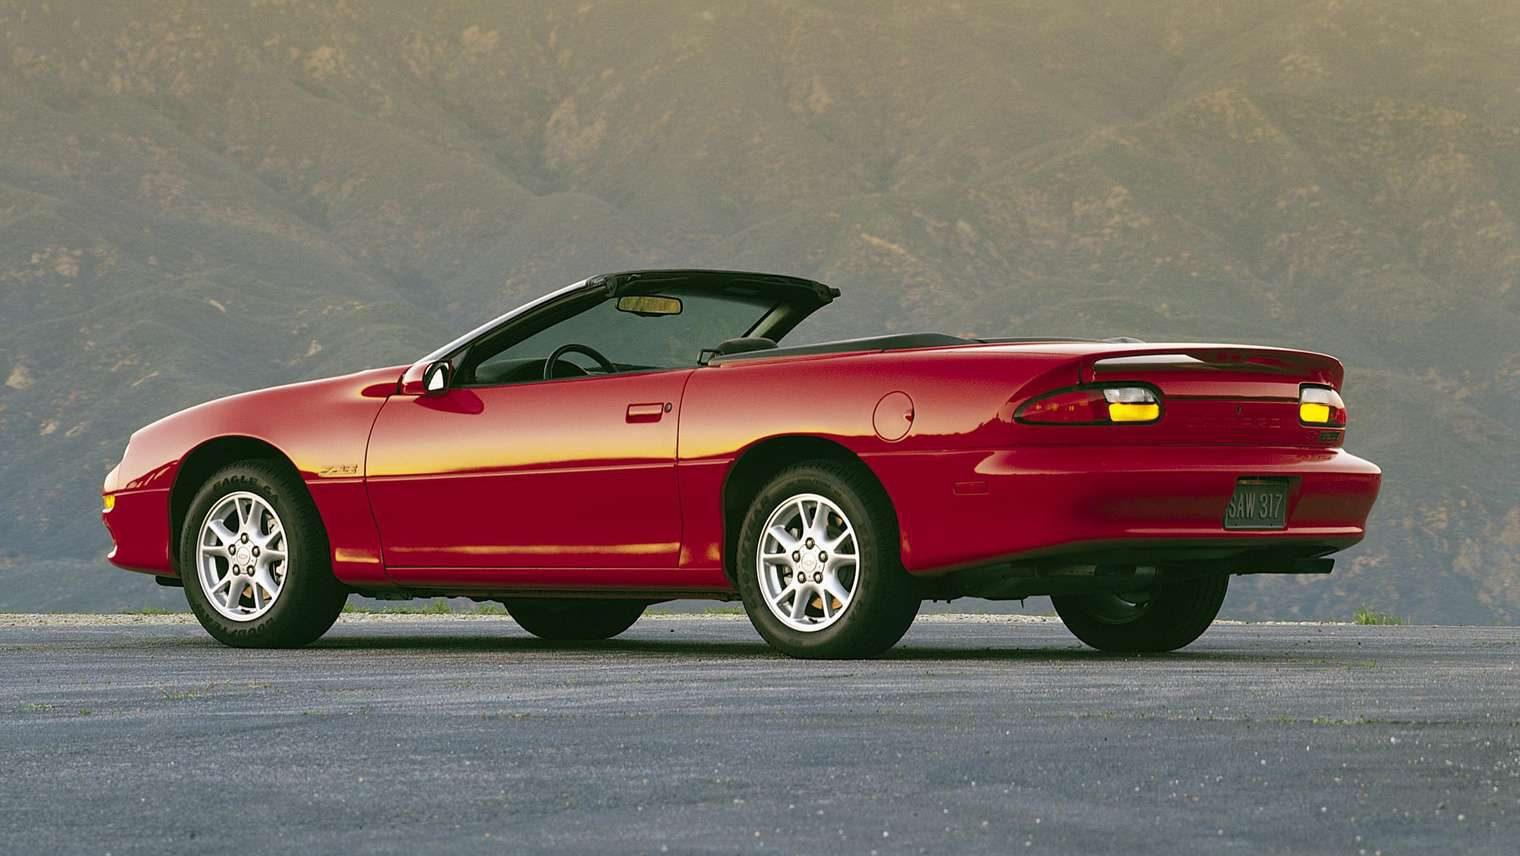 Chevrolet Camaro Convertible (red)